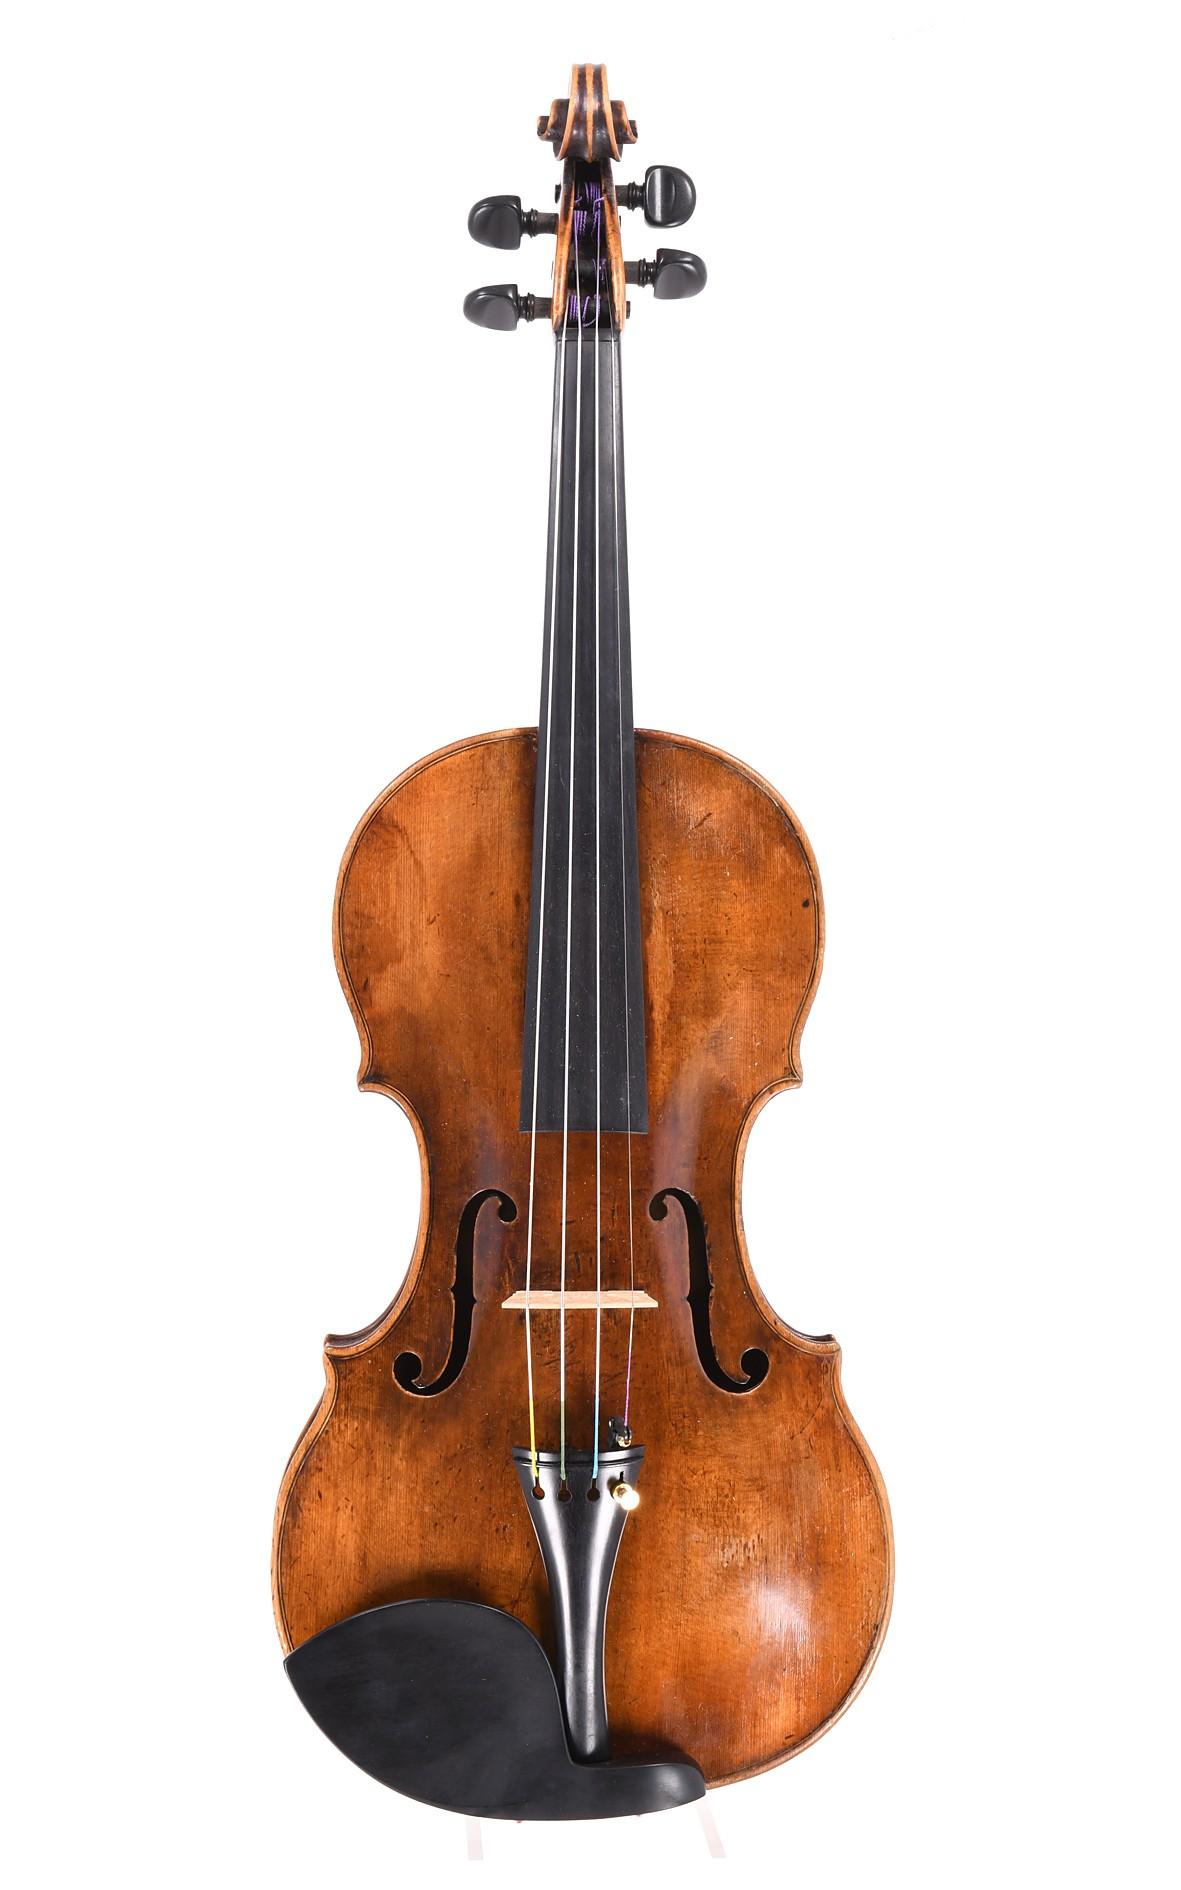 Sebastian Klotz Geige um 1750